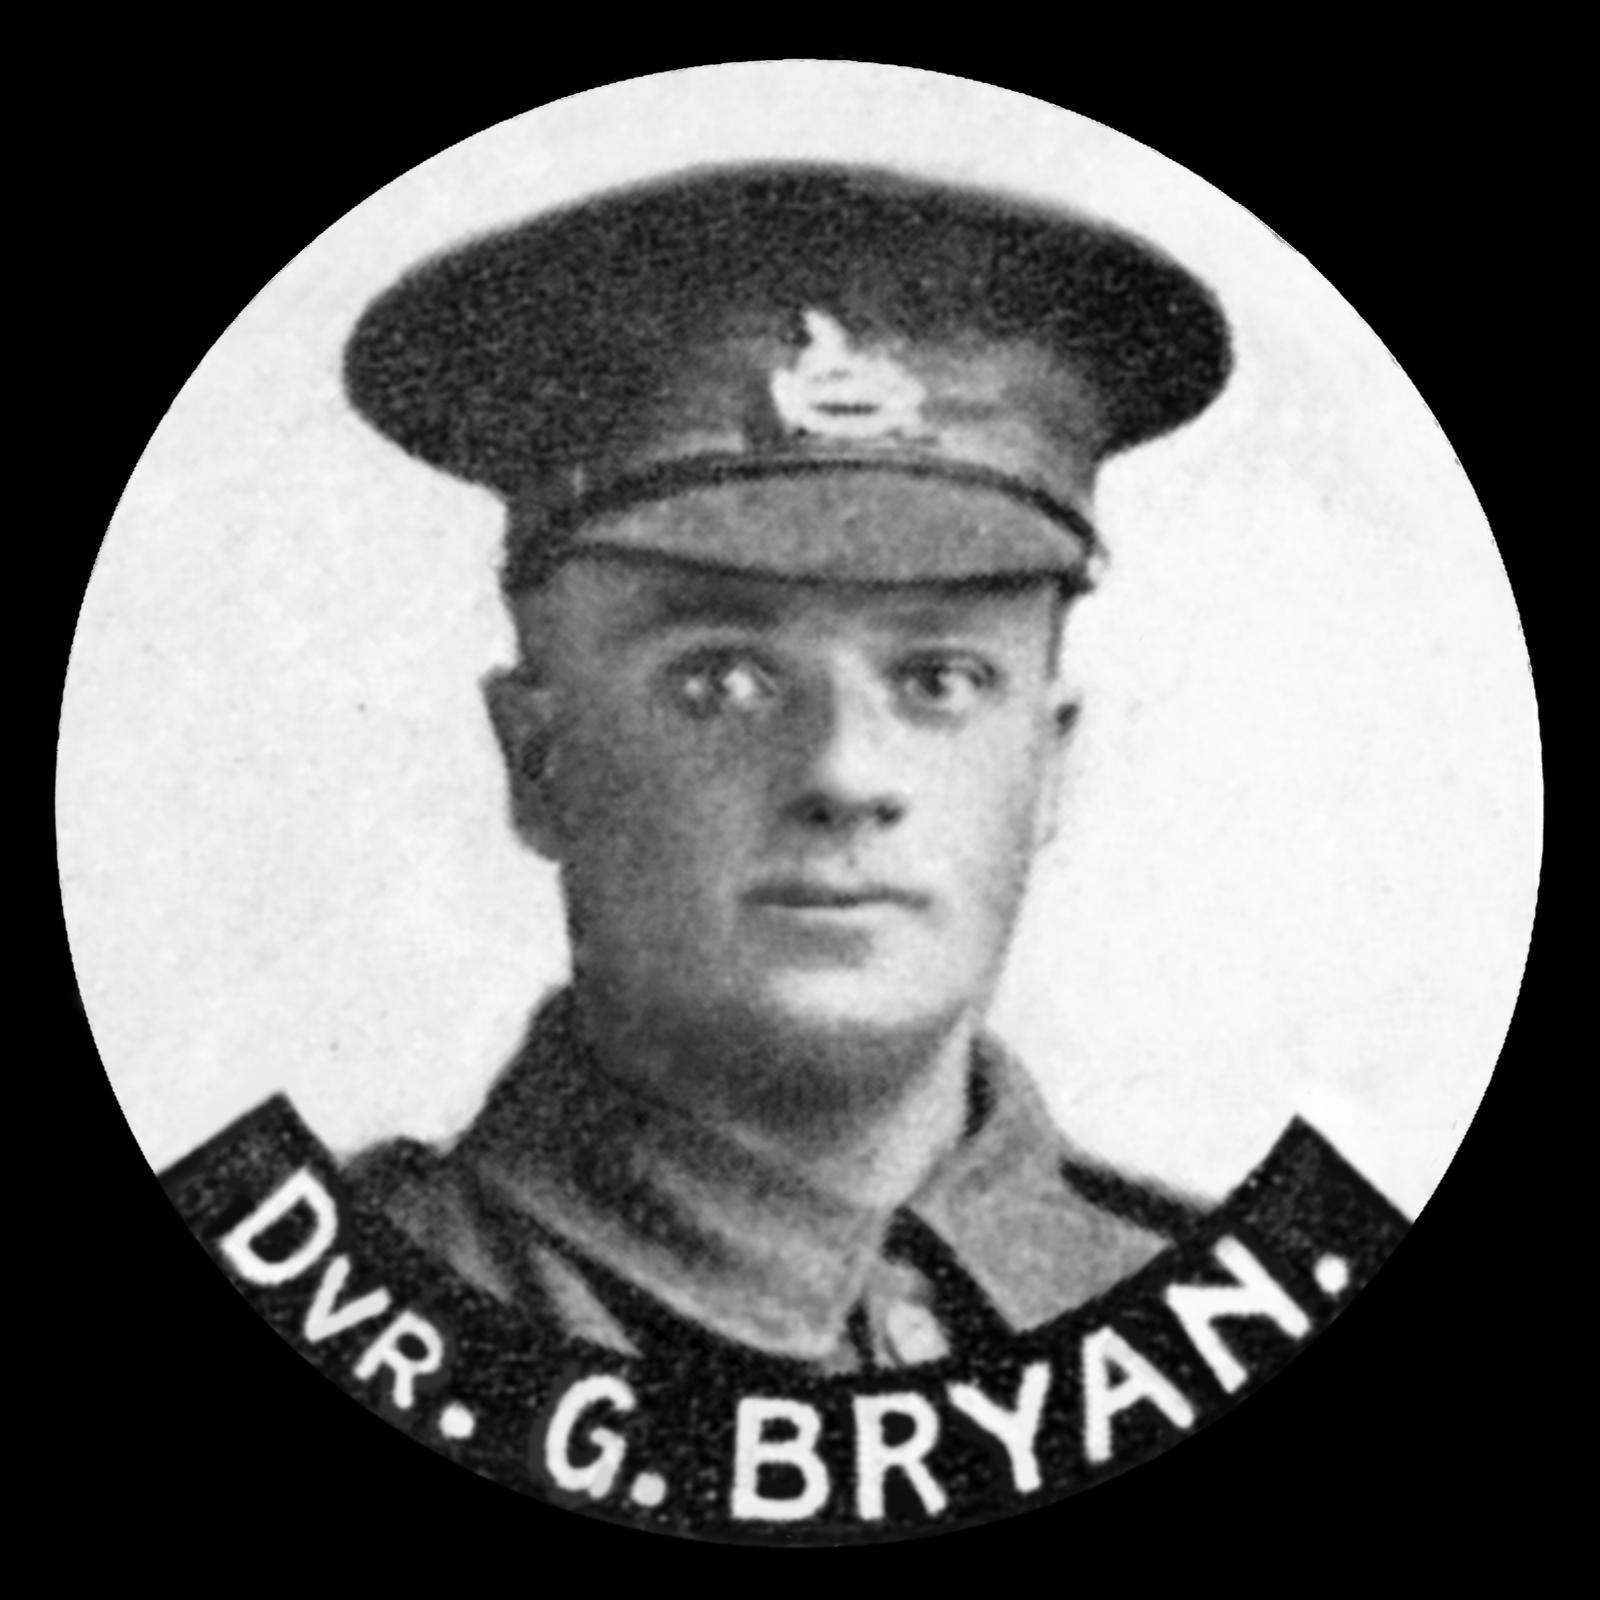 BRYAN George